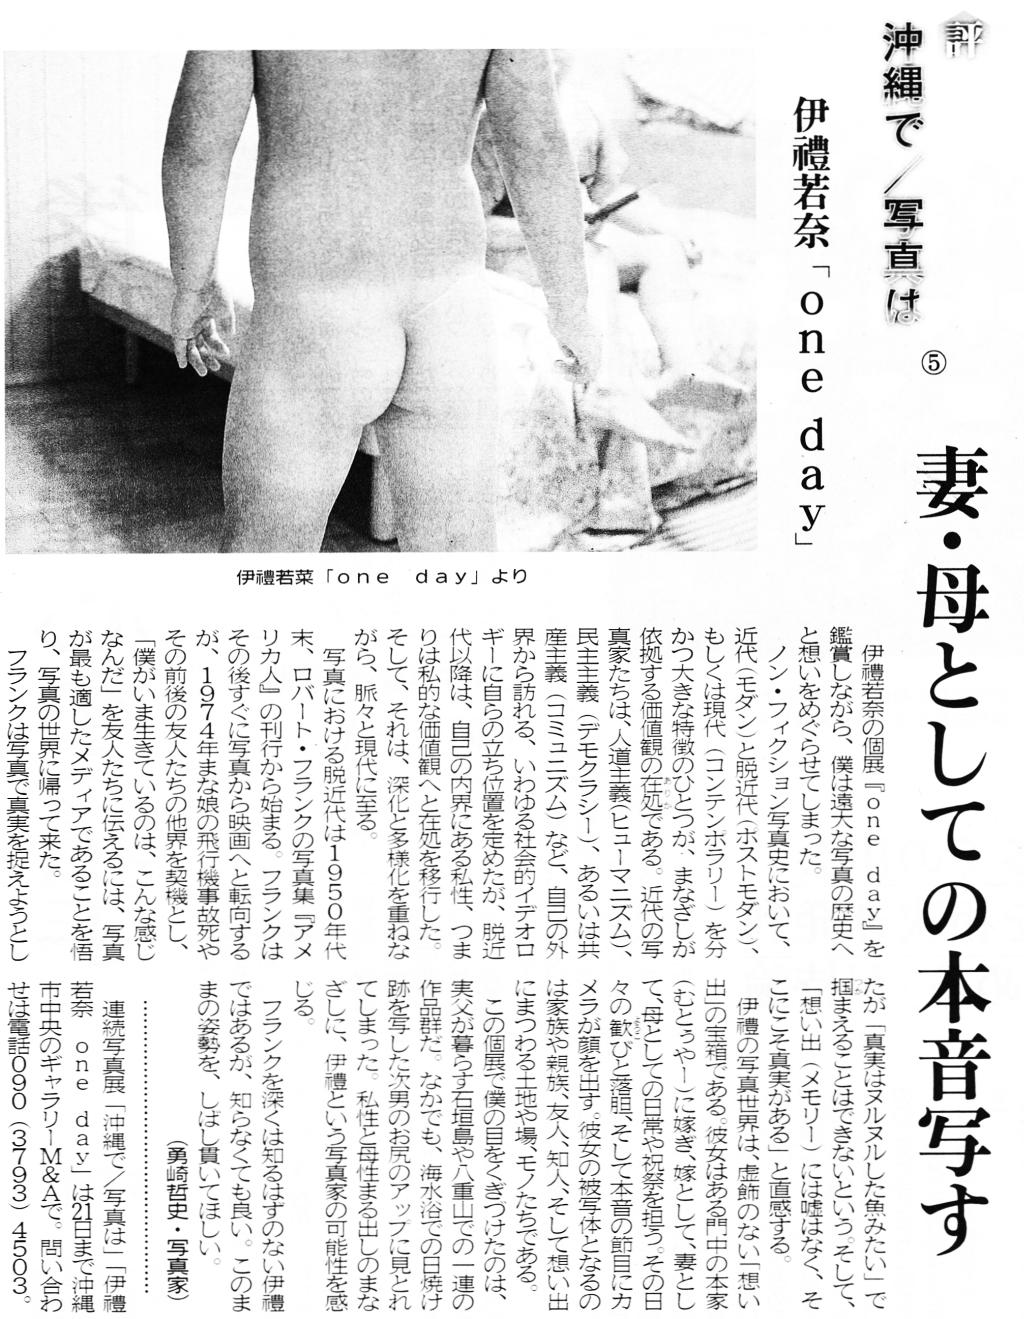 20121019_times_ireiwakana_yuzaki.jpg